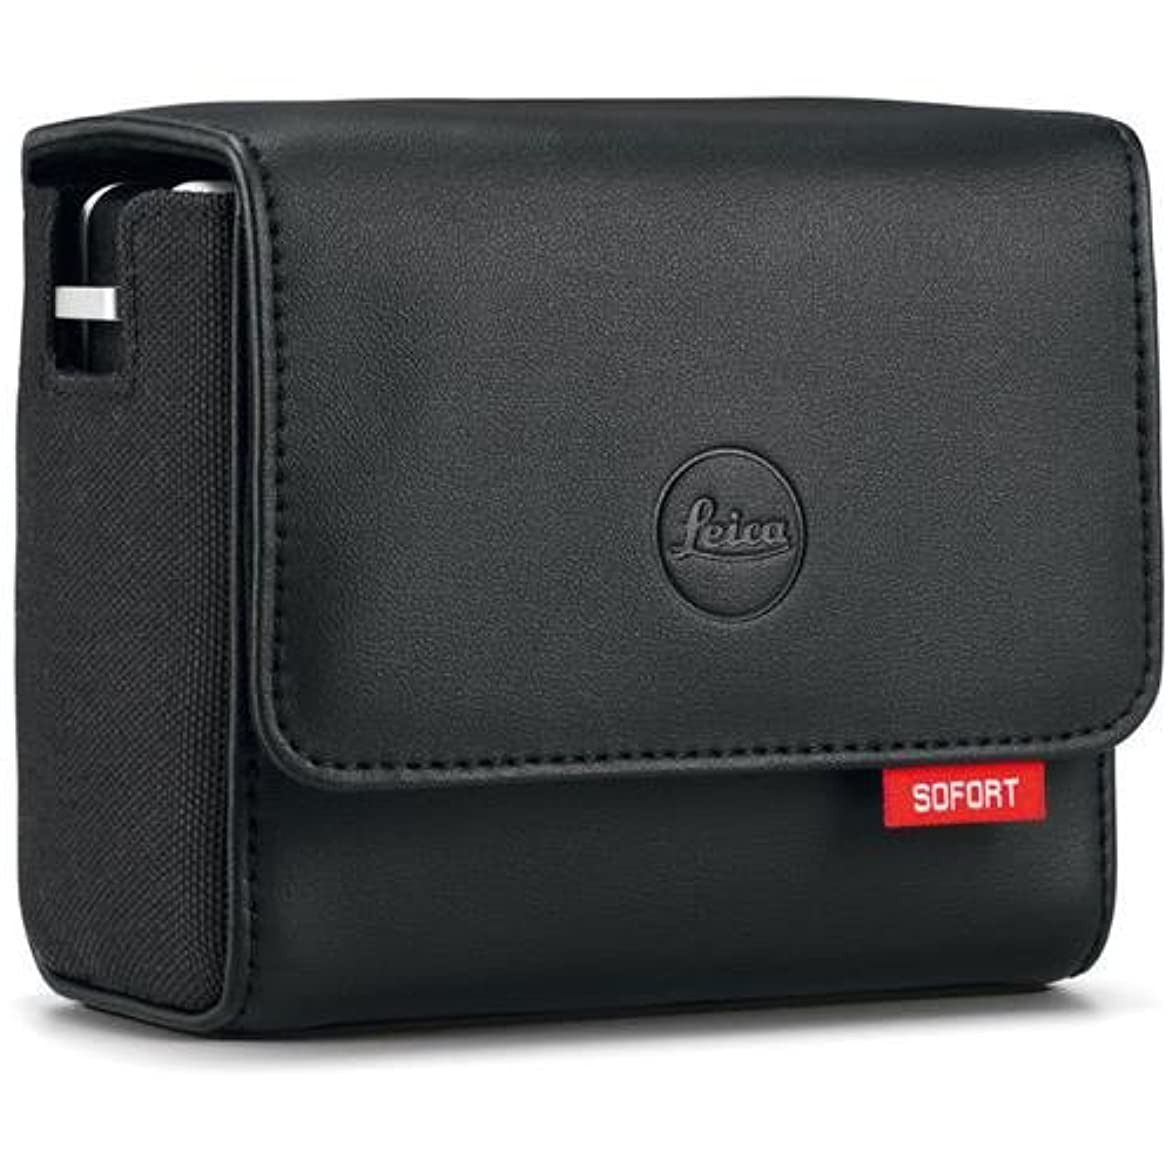 Leica Case for SOFORT Instant Camera, Black